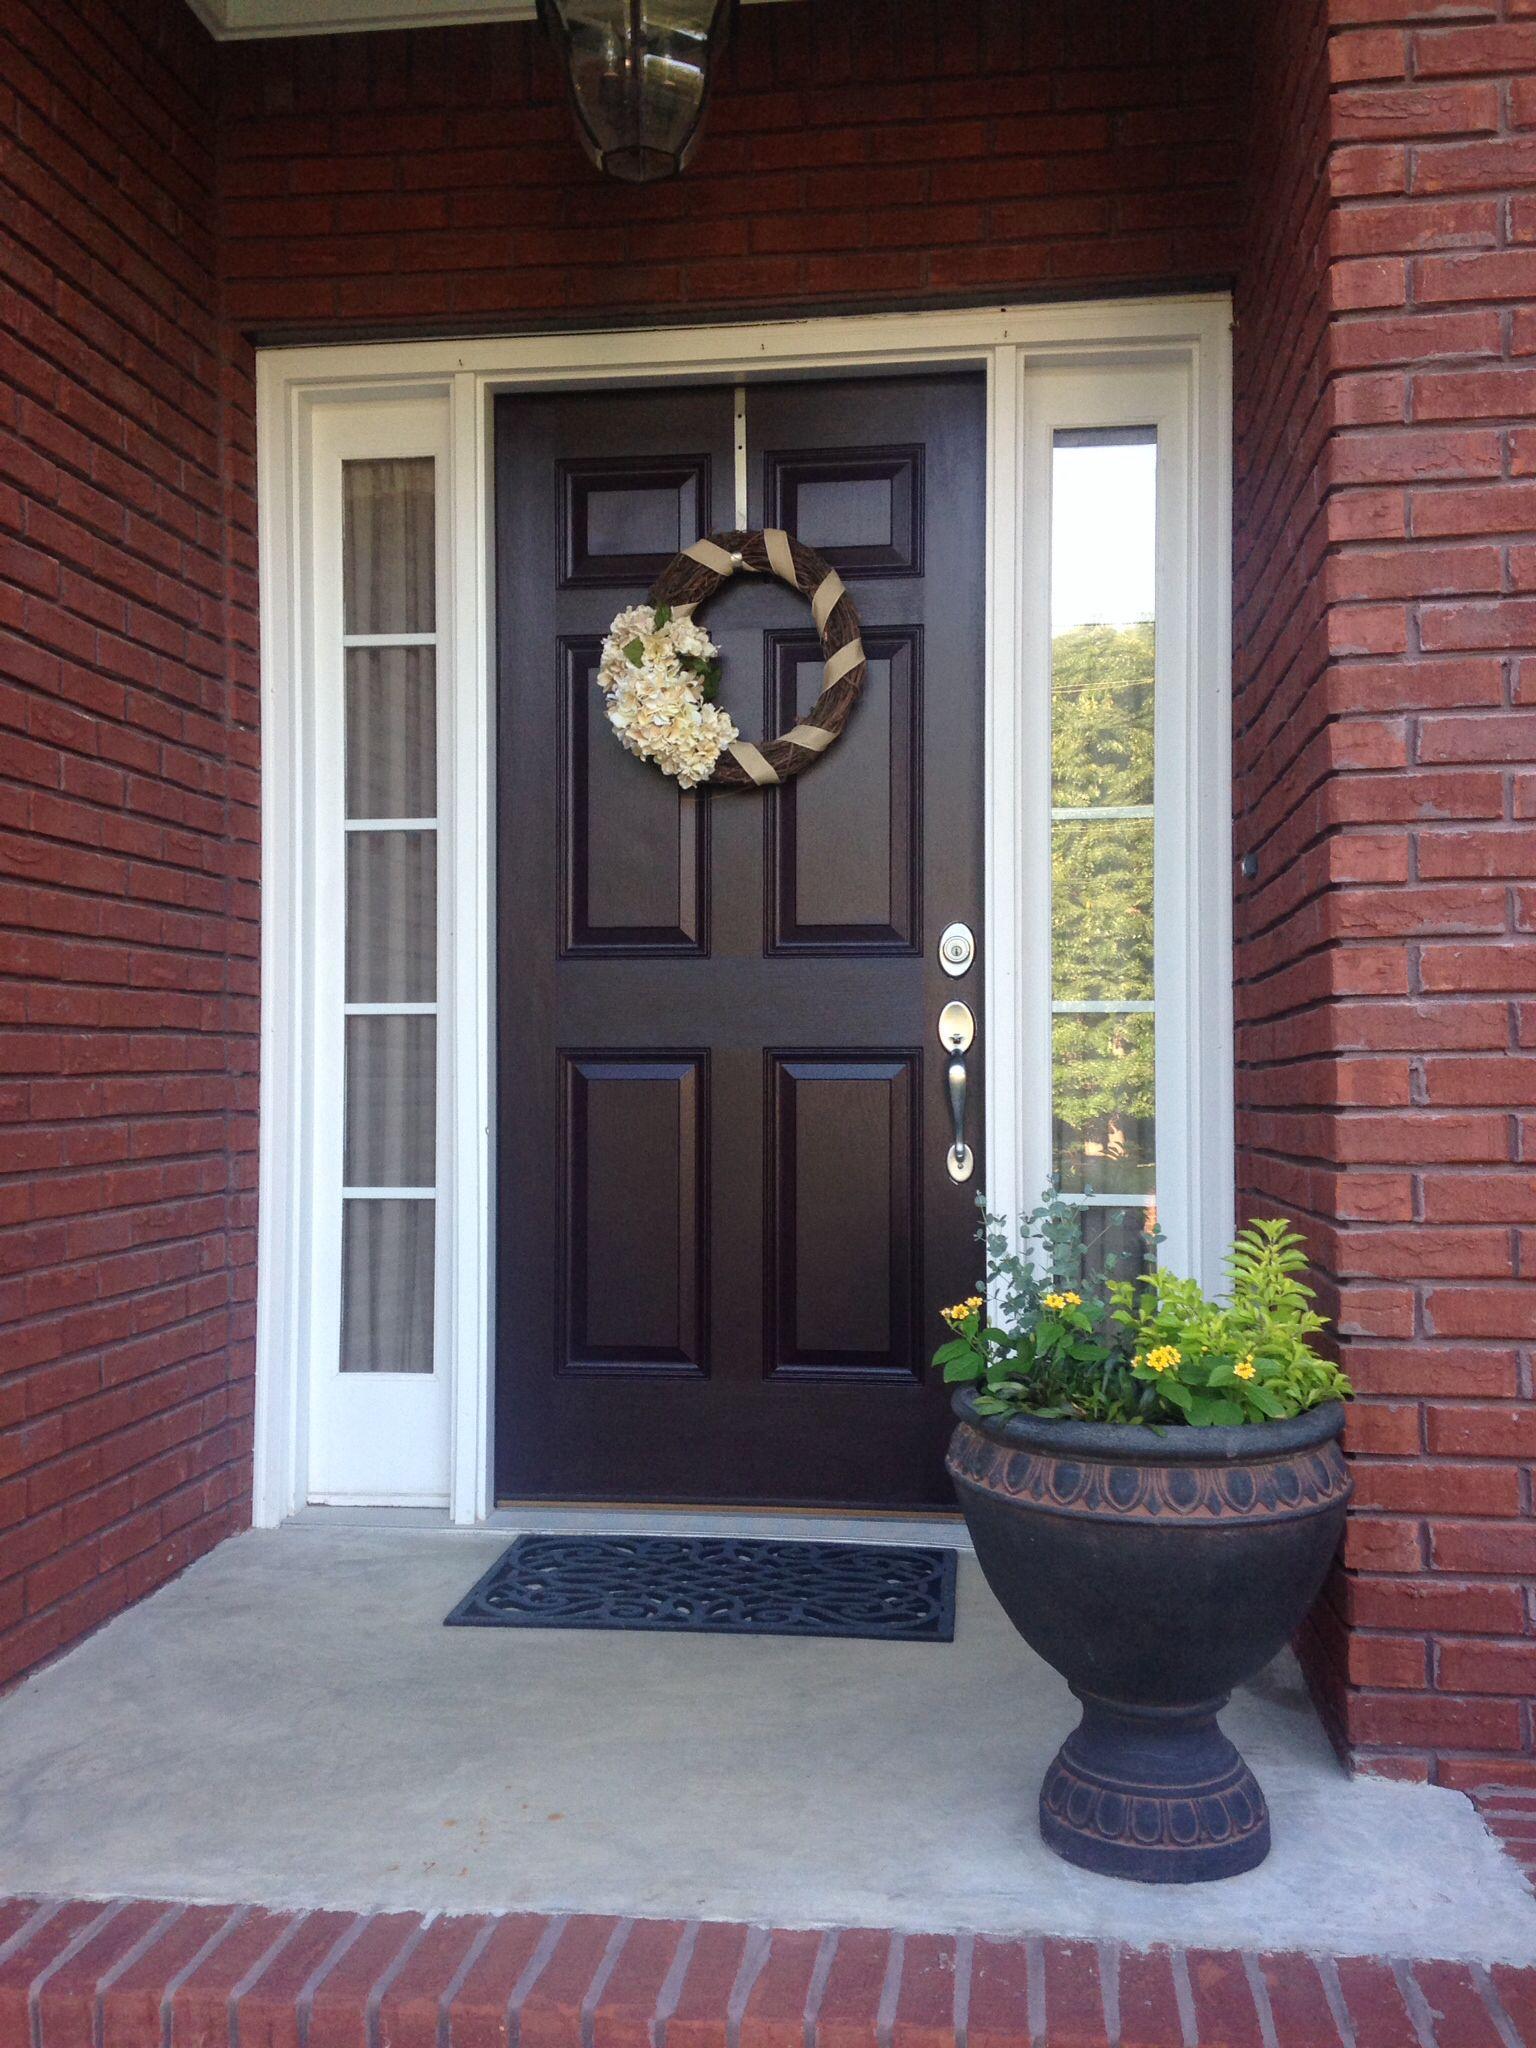 Sherwin williams raisin front door color home for Colors of front doors